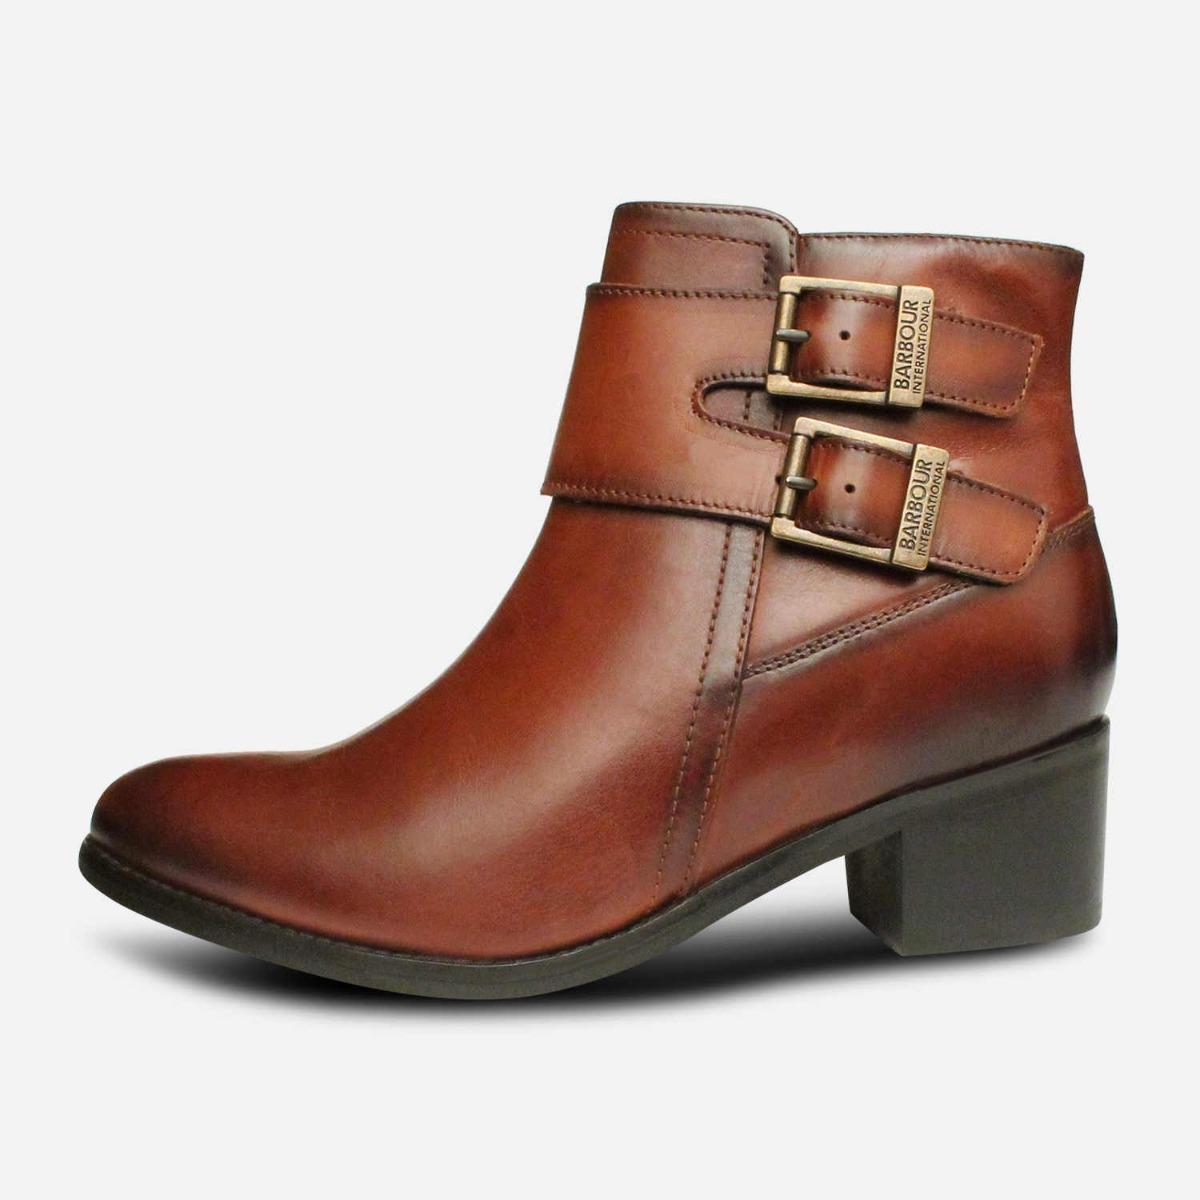 Barbour International Premium Inglewood 2 Buckle Boots in Tan